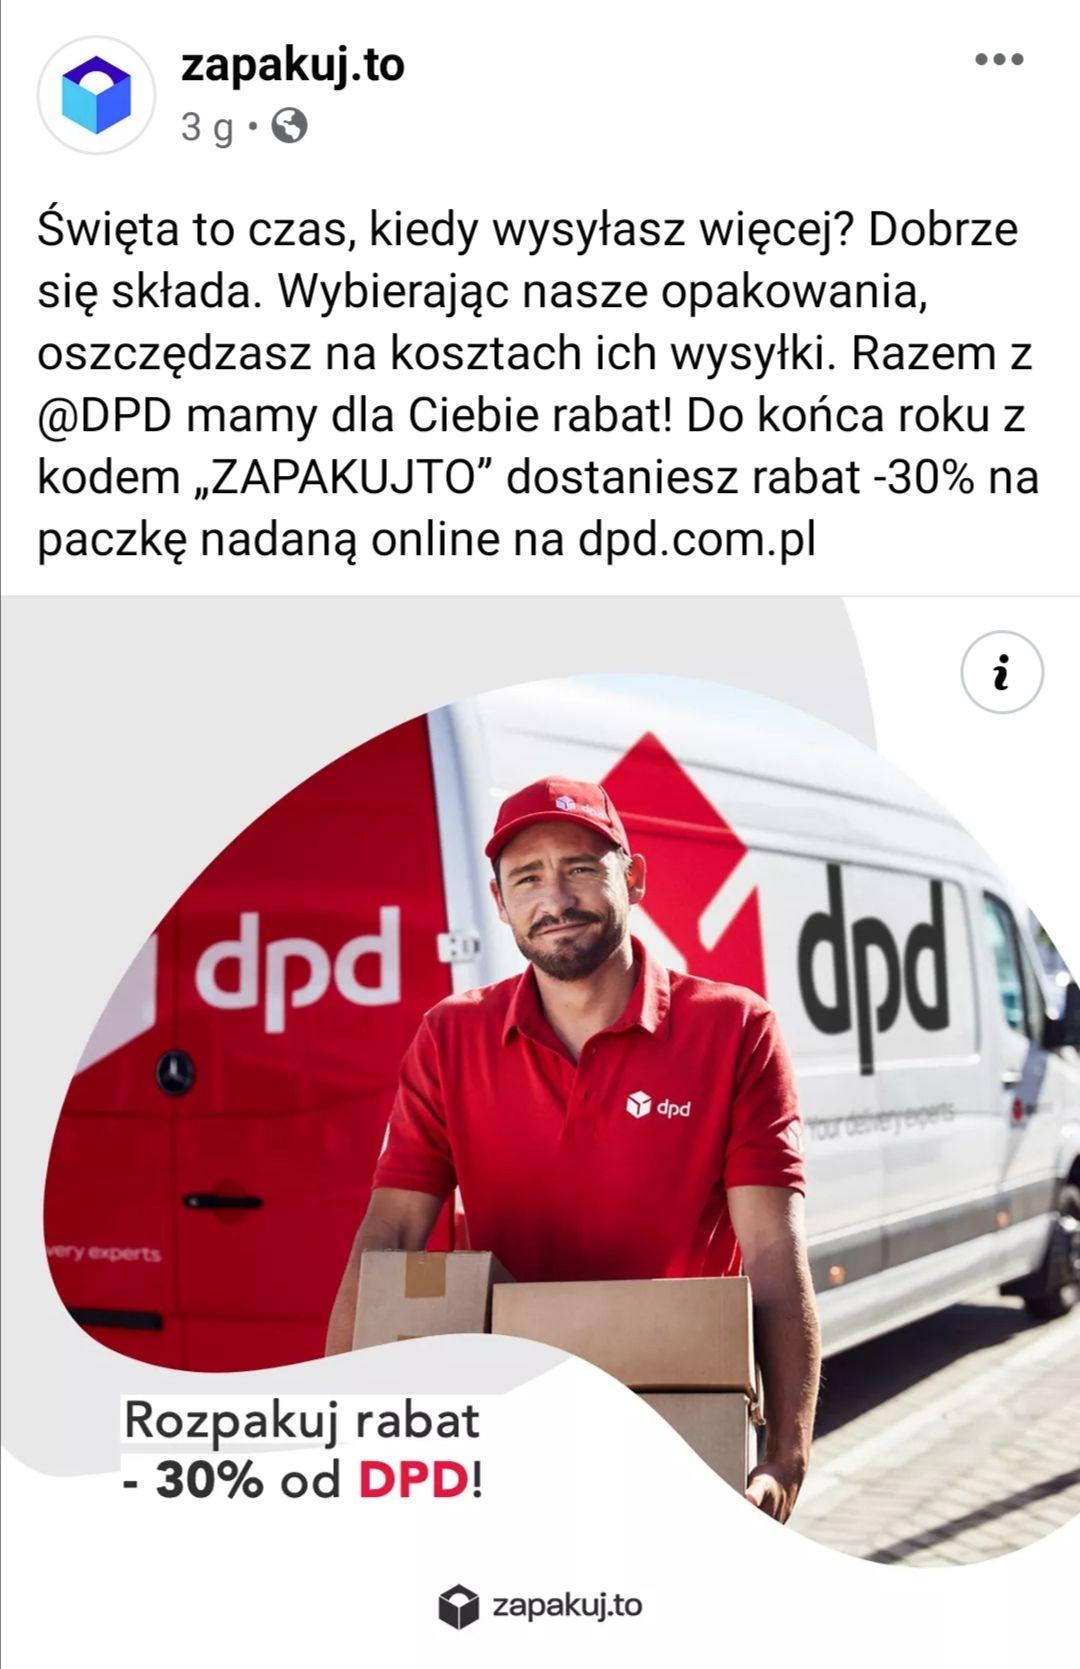 Dpd - 30%